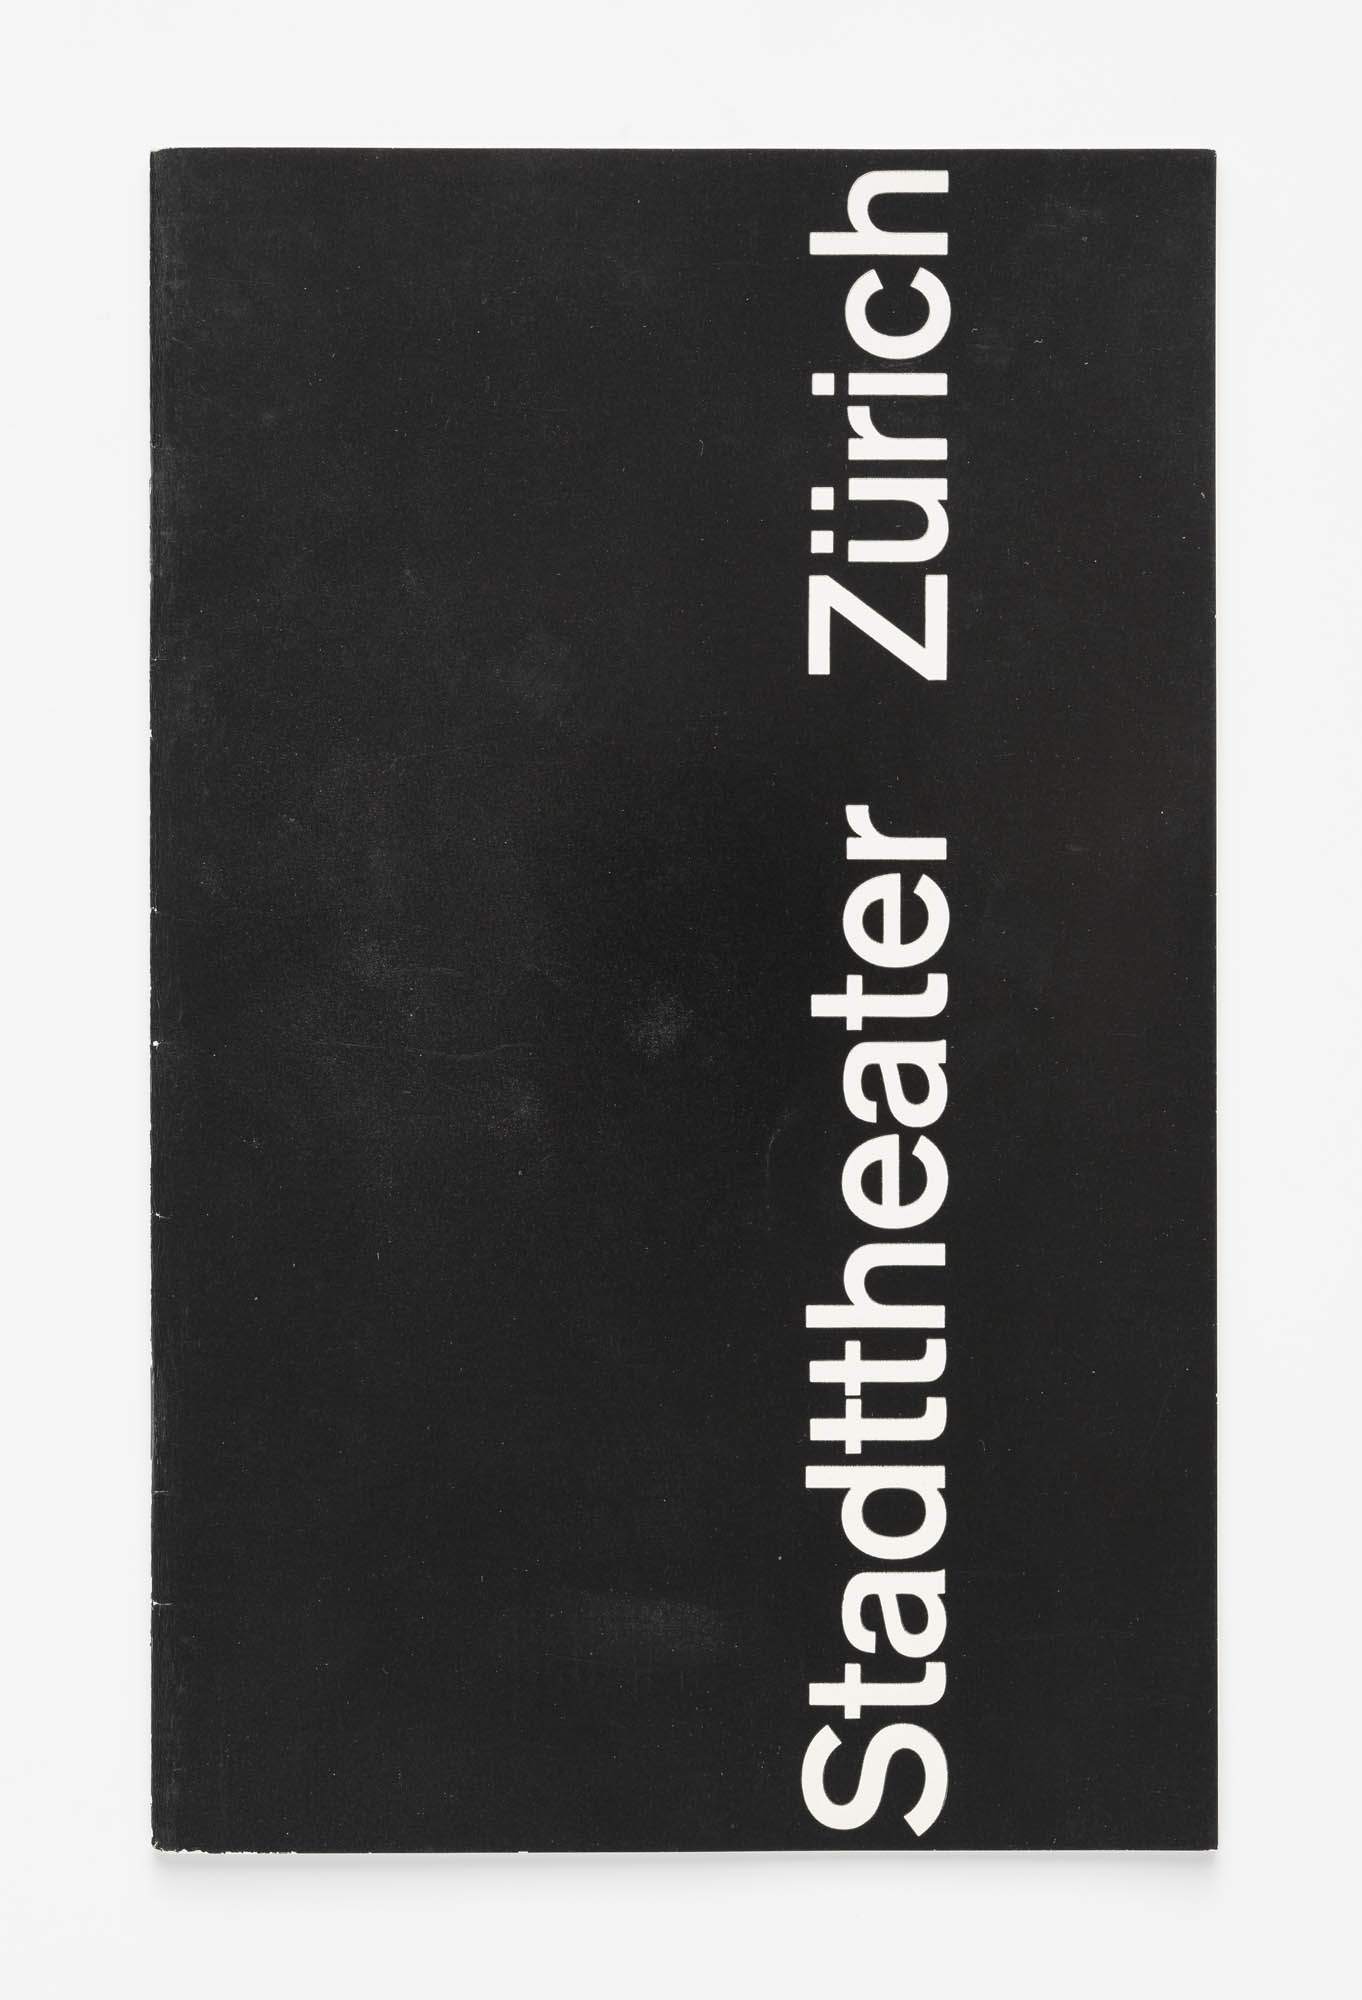 Juni-Festwochen Zürich Josef Müller-Brockmann